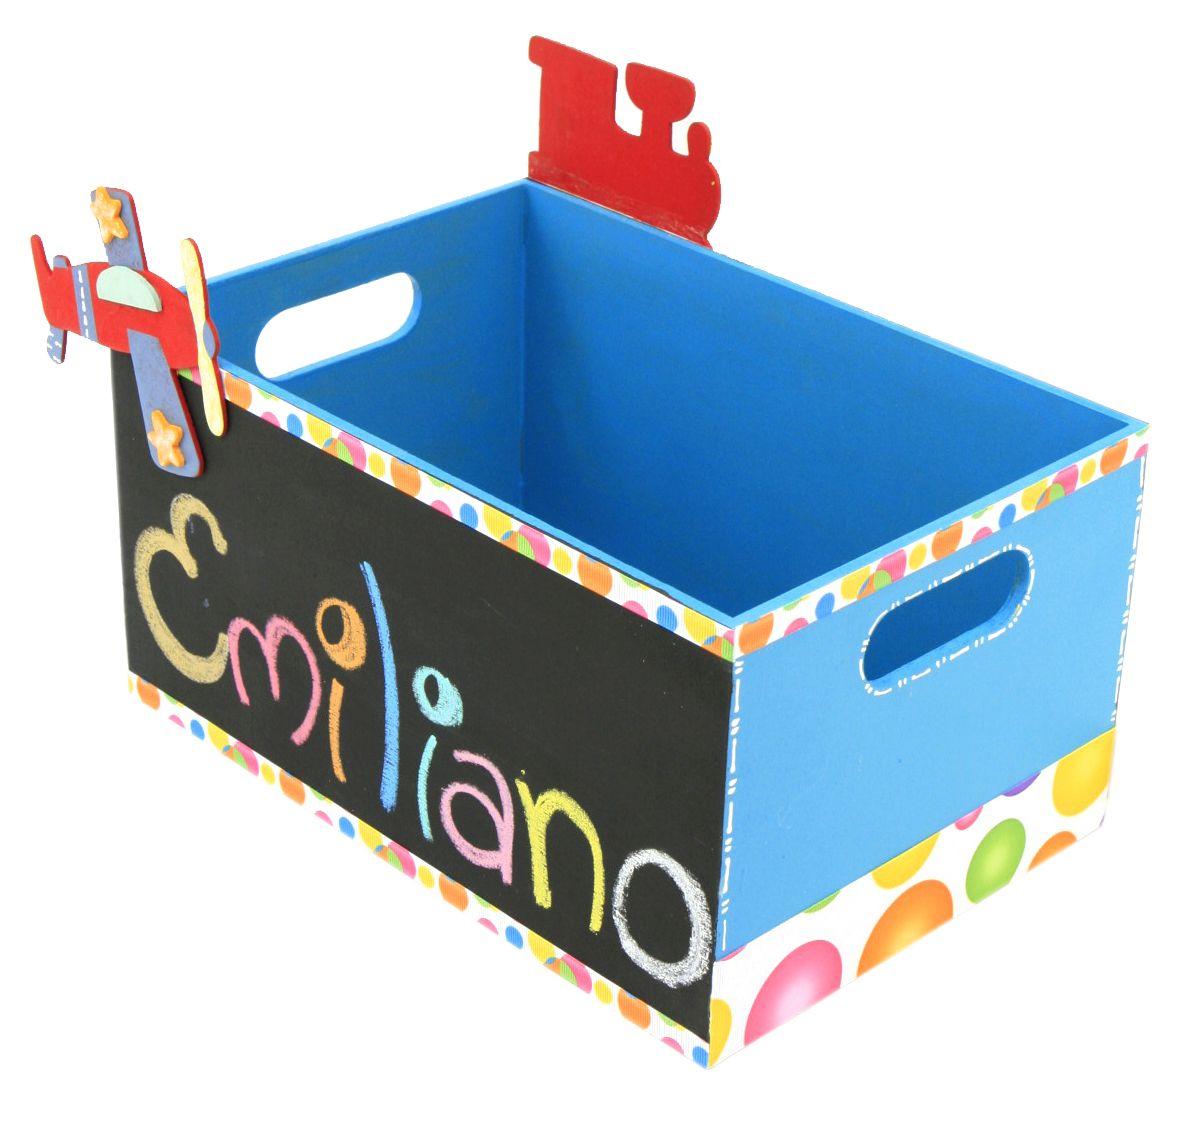 Original caja de madera con pizarr n color azul pintura - Cajas de carton decoradas para bebes ...